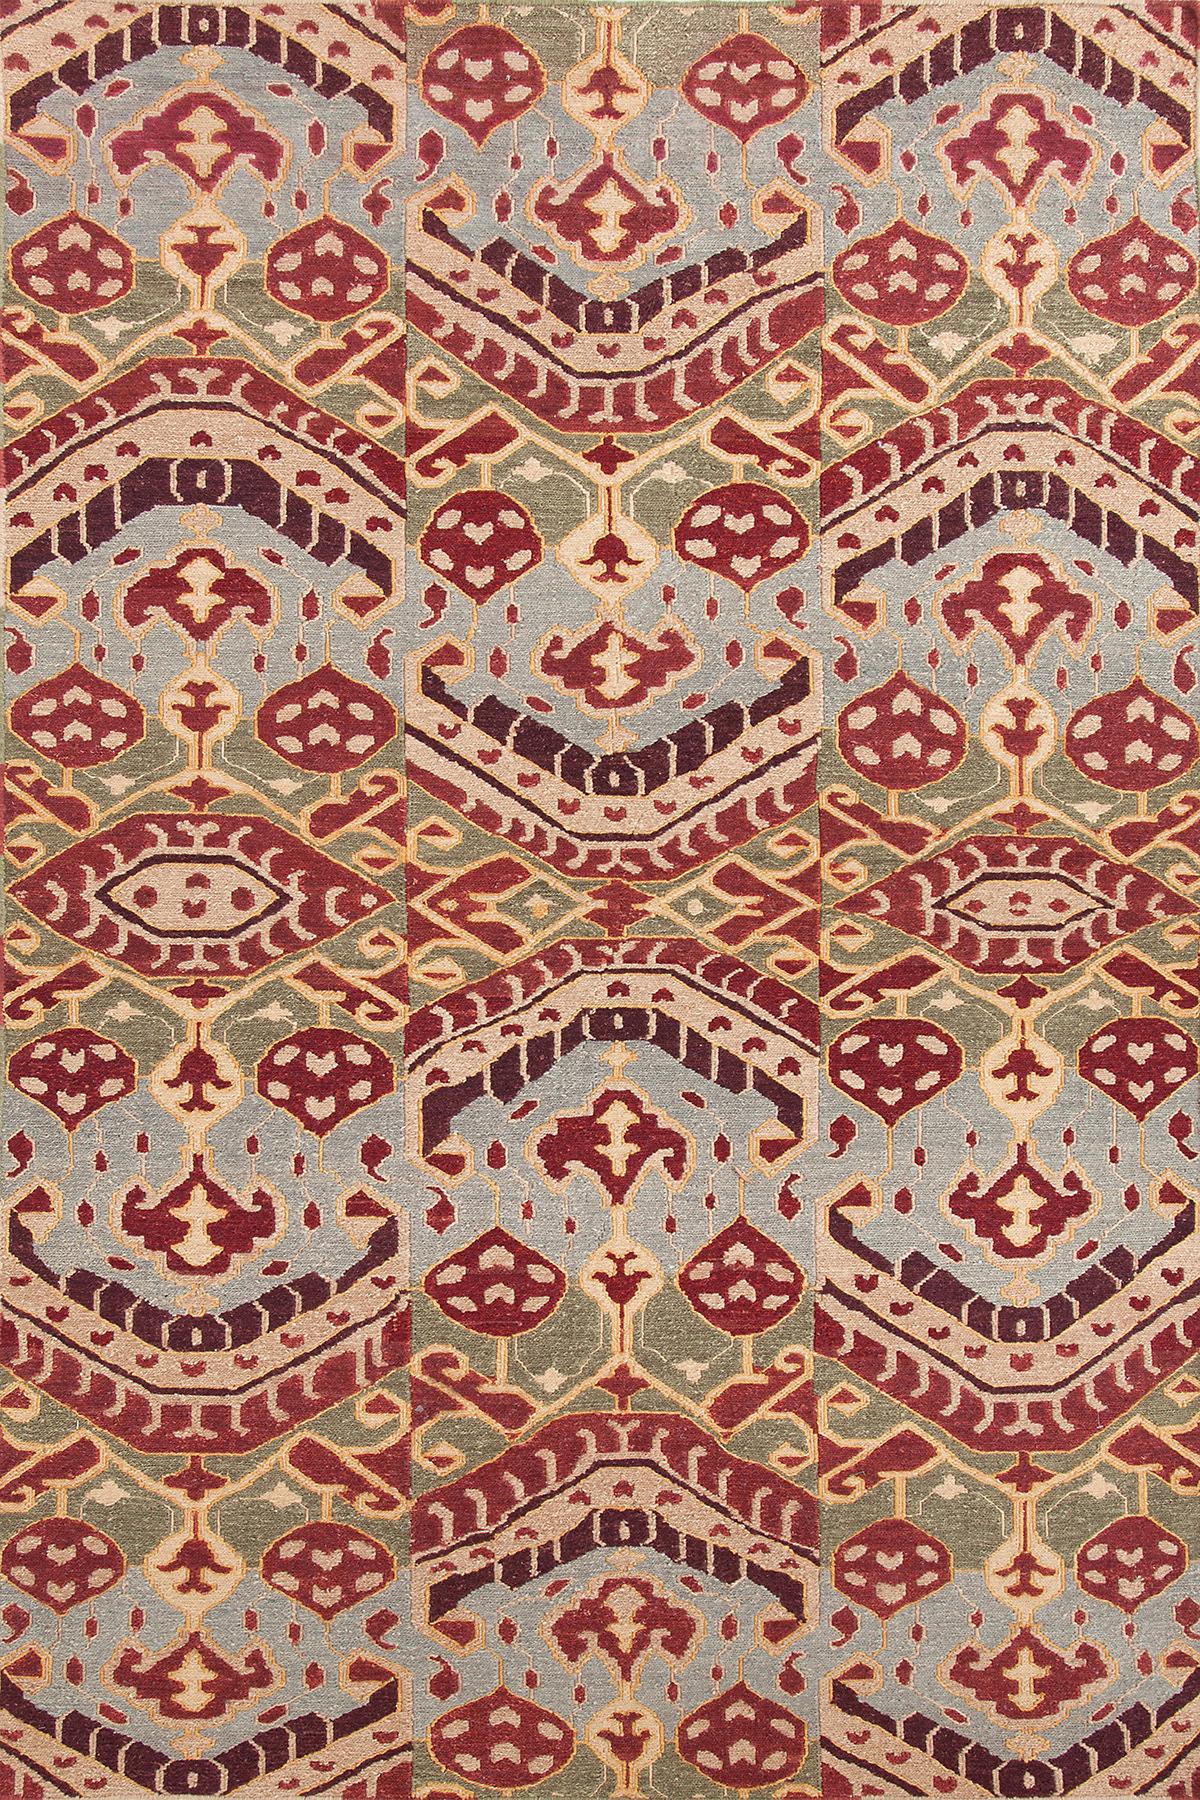 Joya Soumak Wool Woven Rug